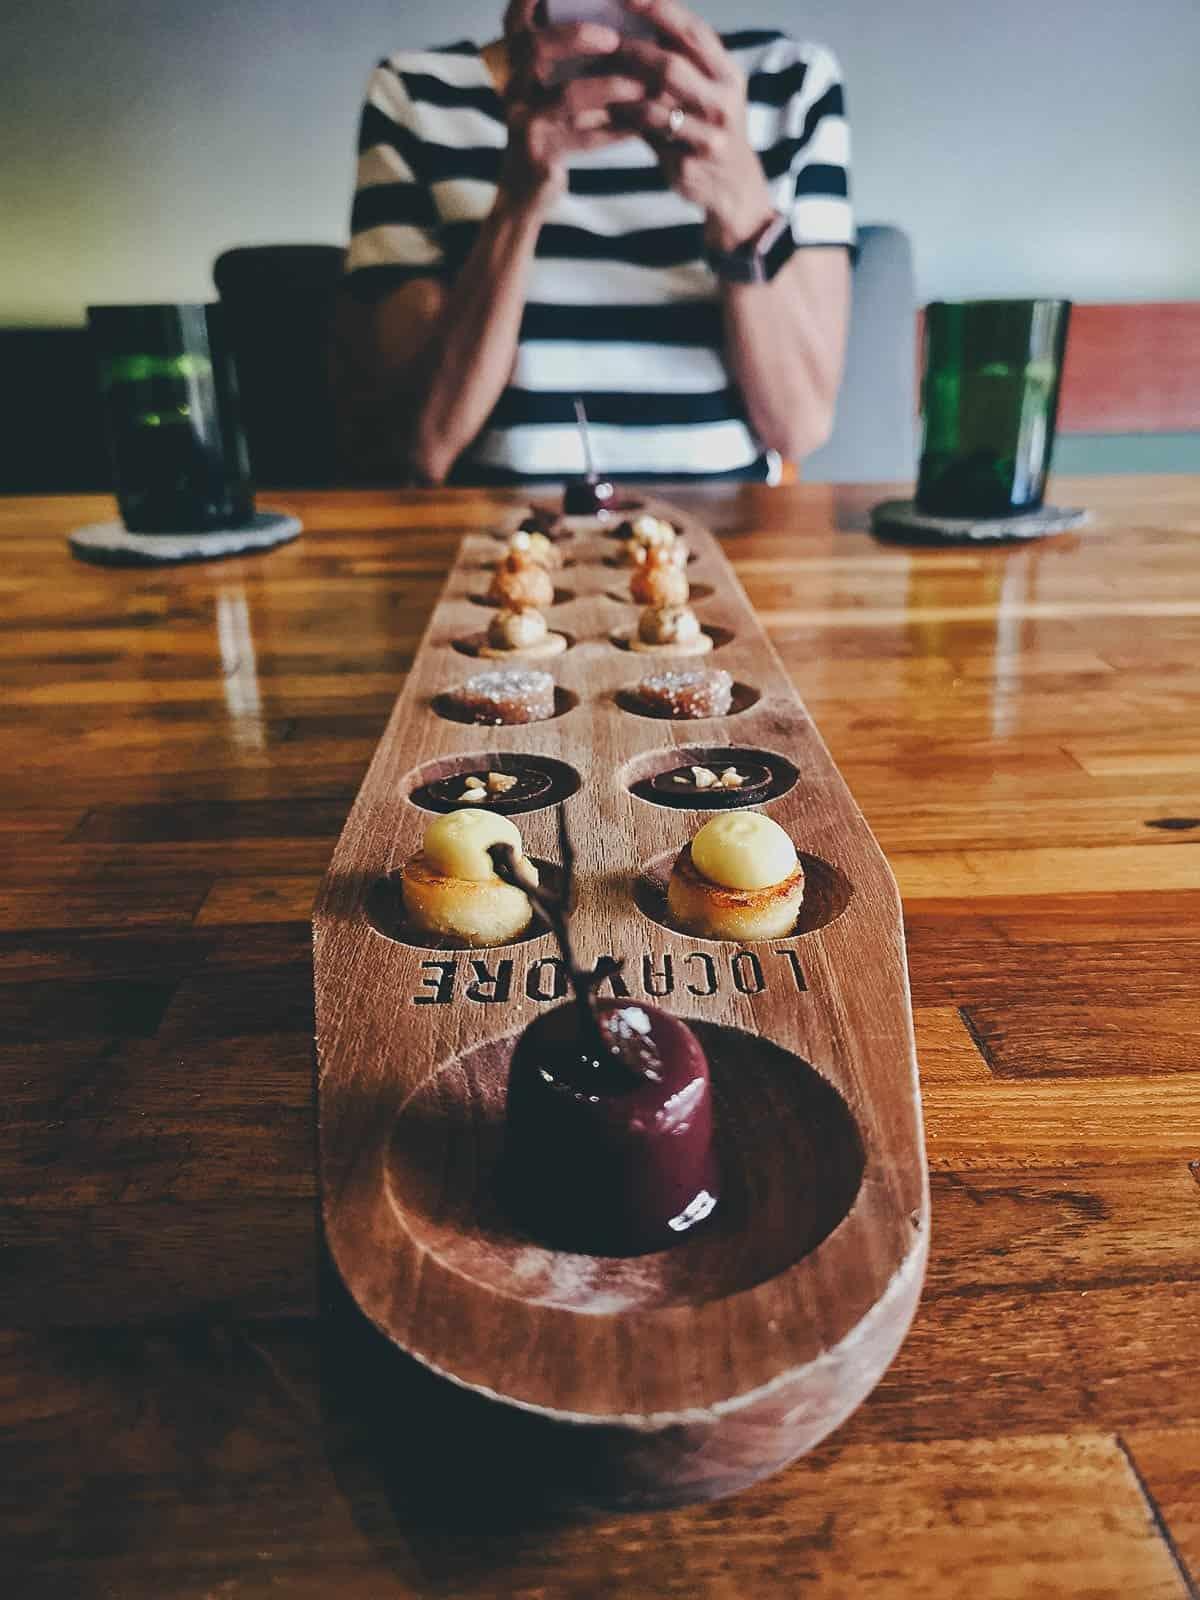 Dessert on a sungka board in Bali, Indonesia